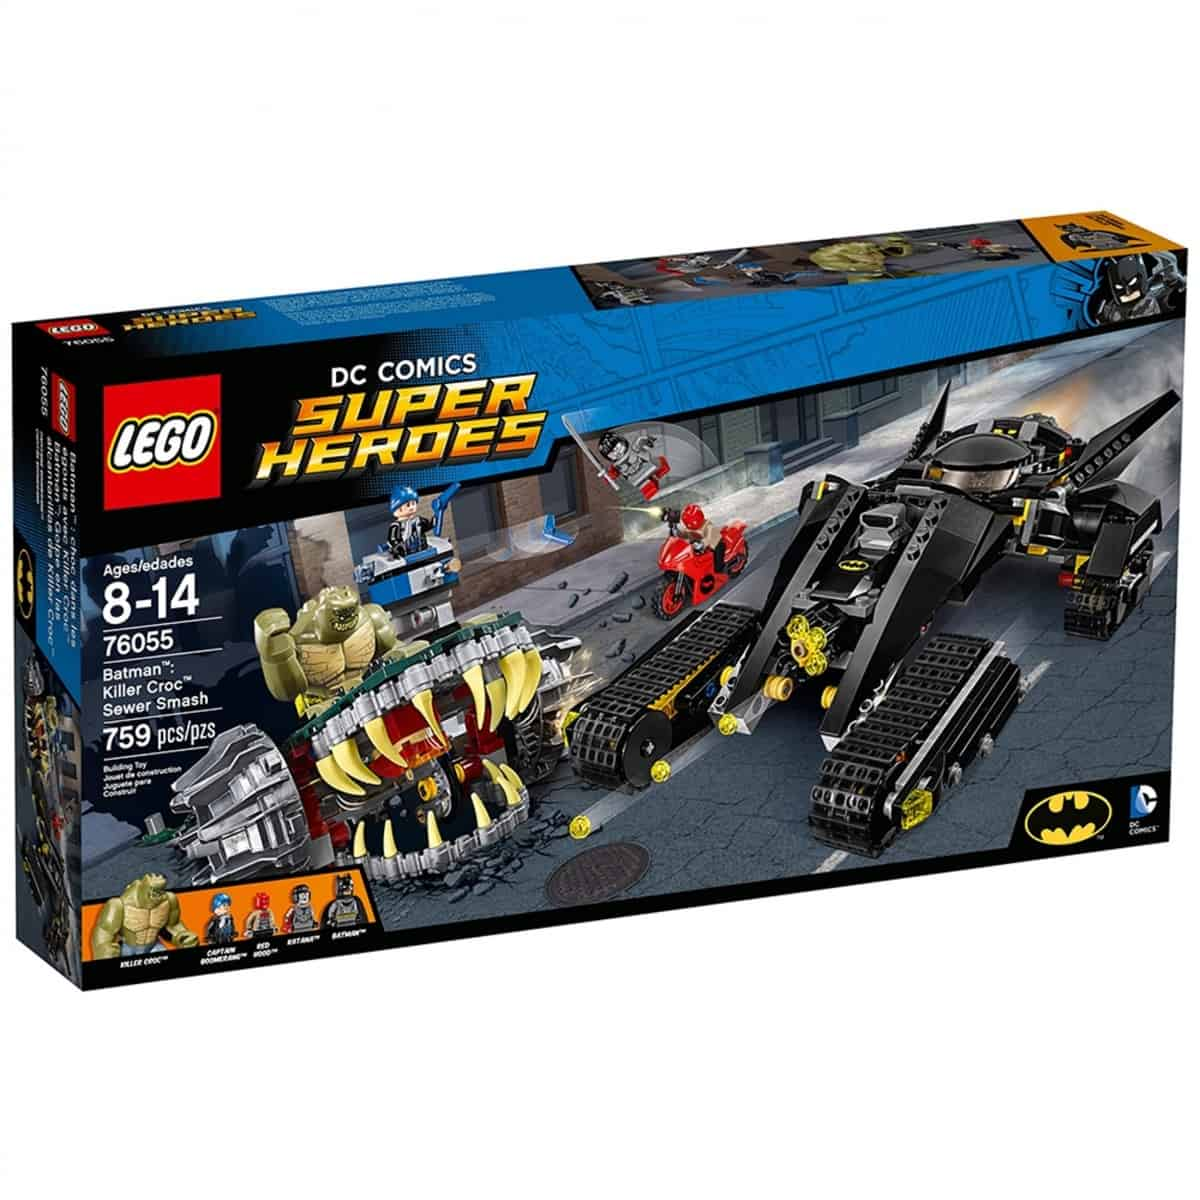 lego 76055 batman killer croc sewer smash scaled